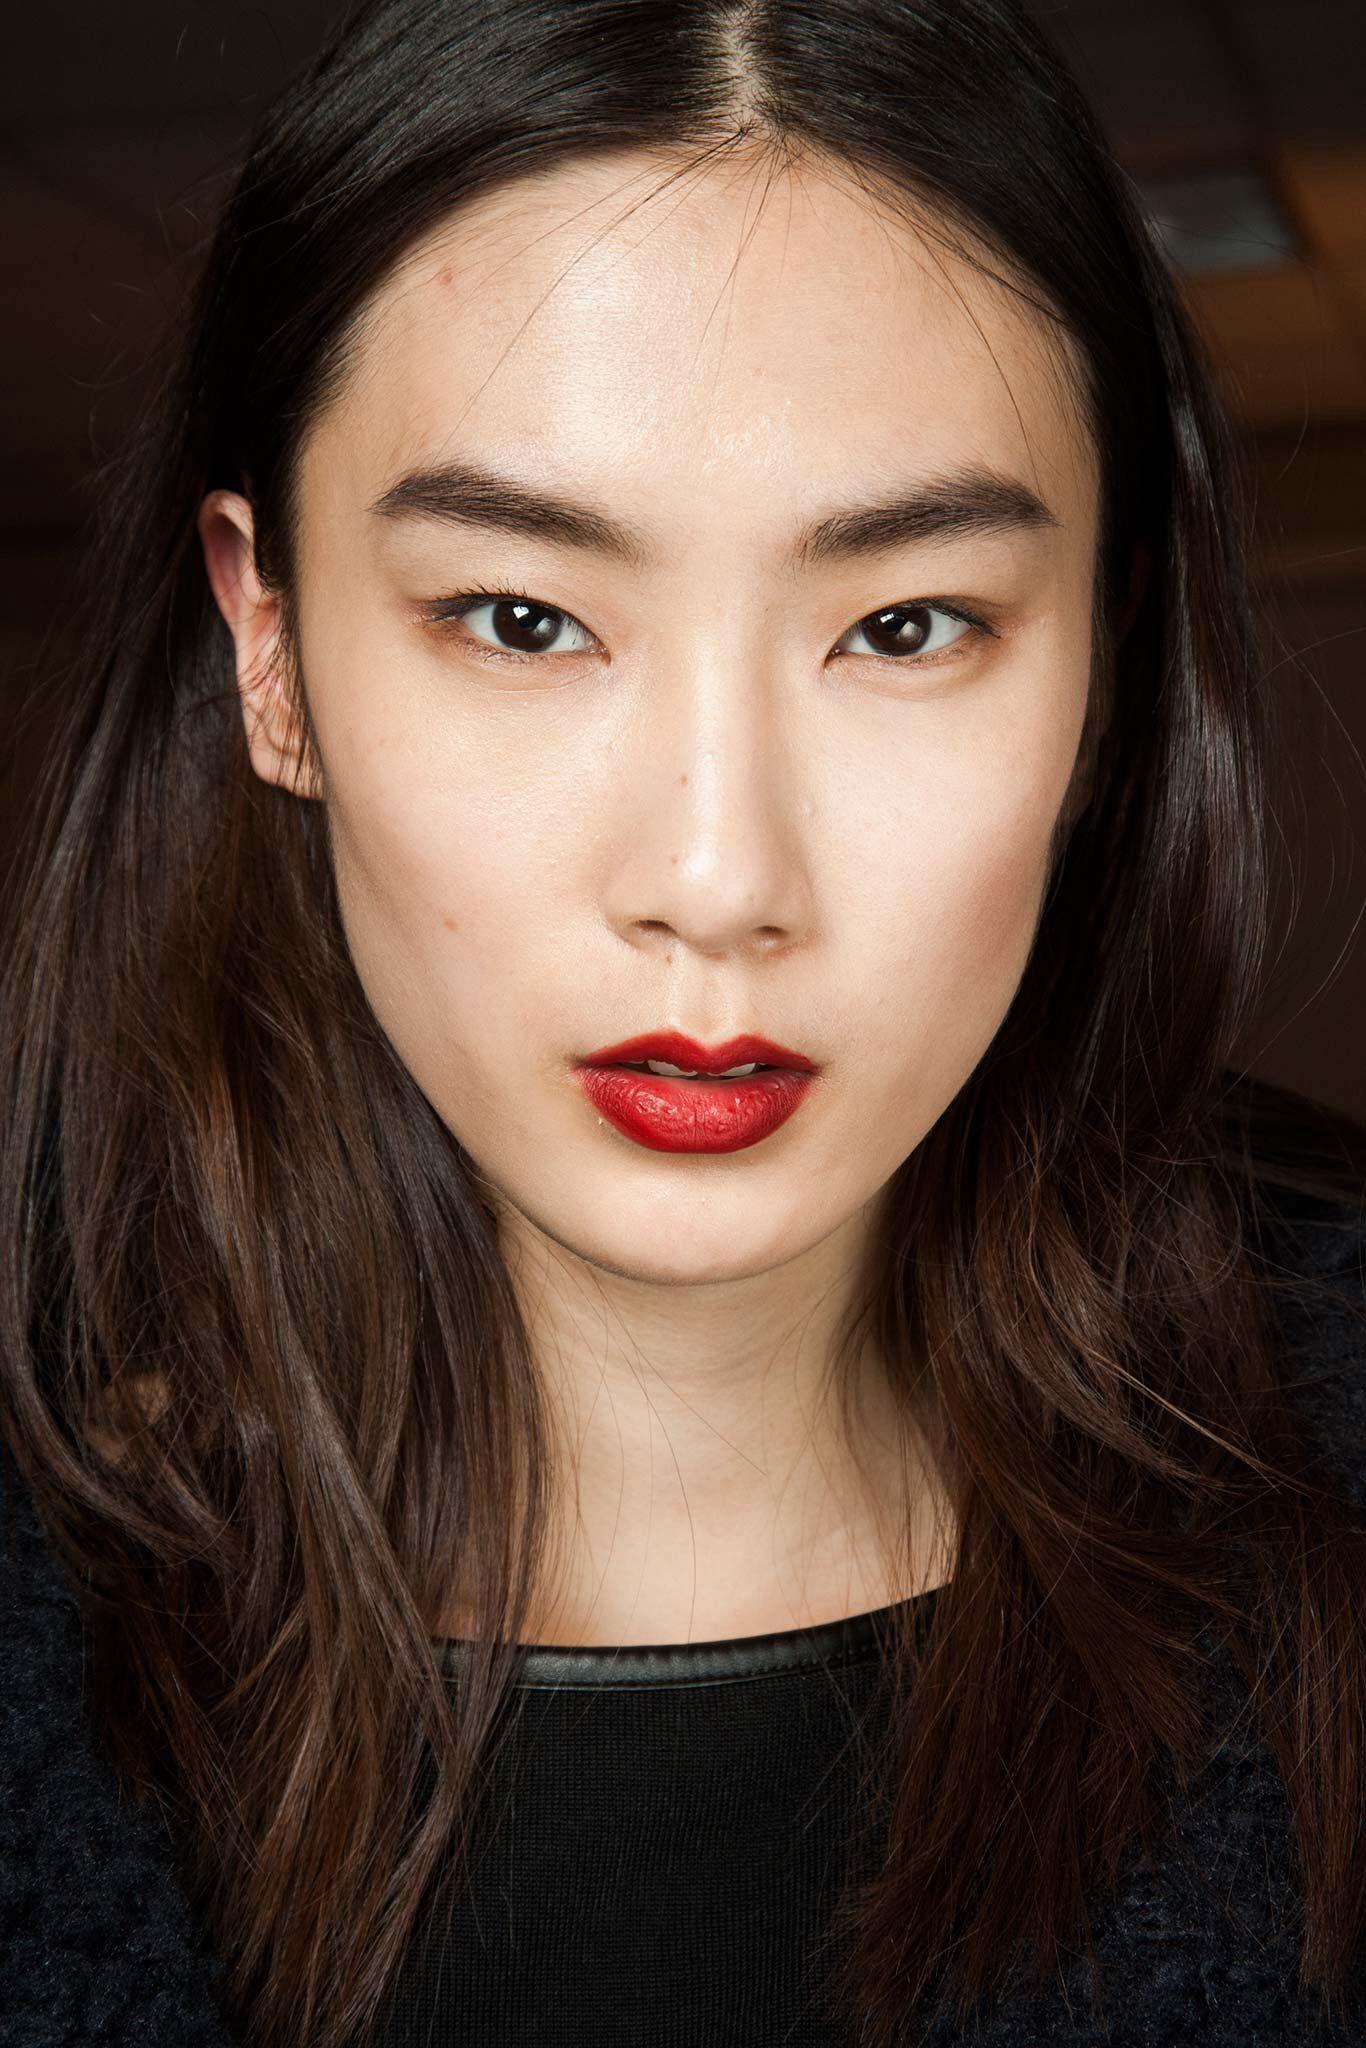 3.1 Phillip Lim, Look 31 Red lipstick makeup looks